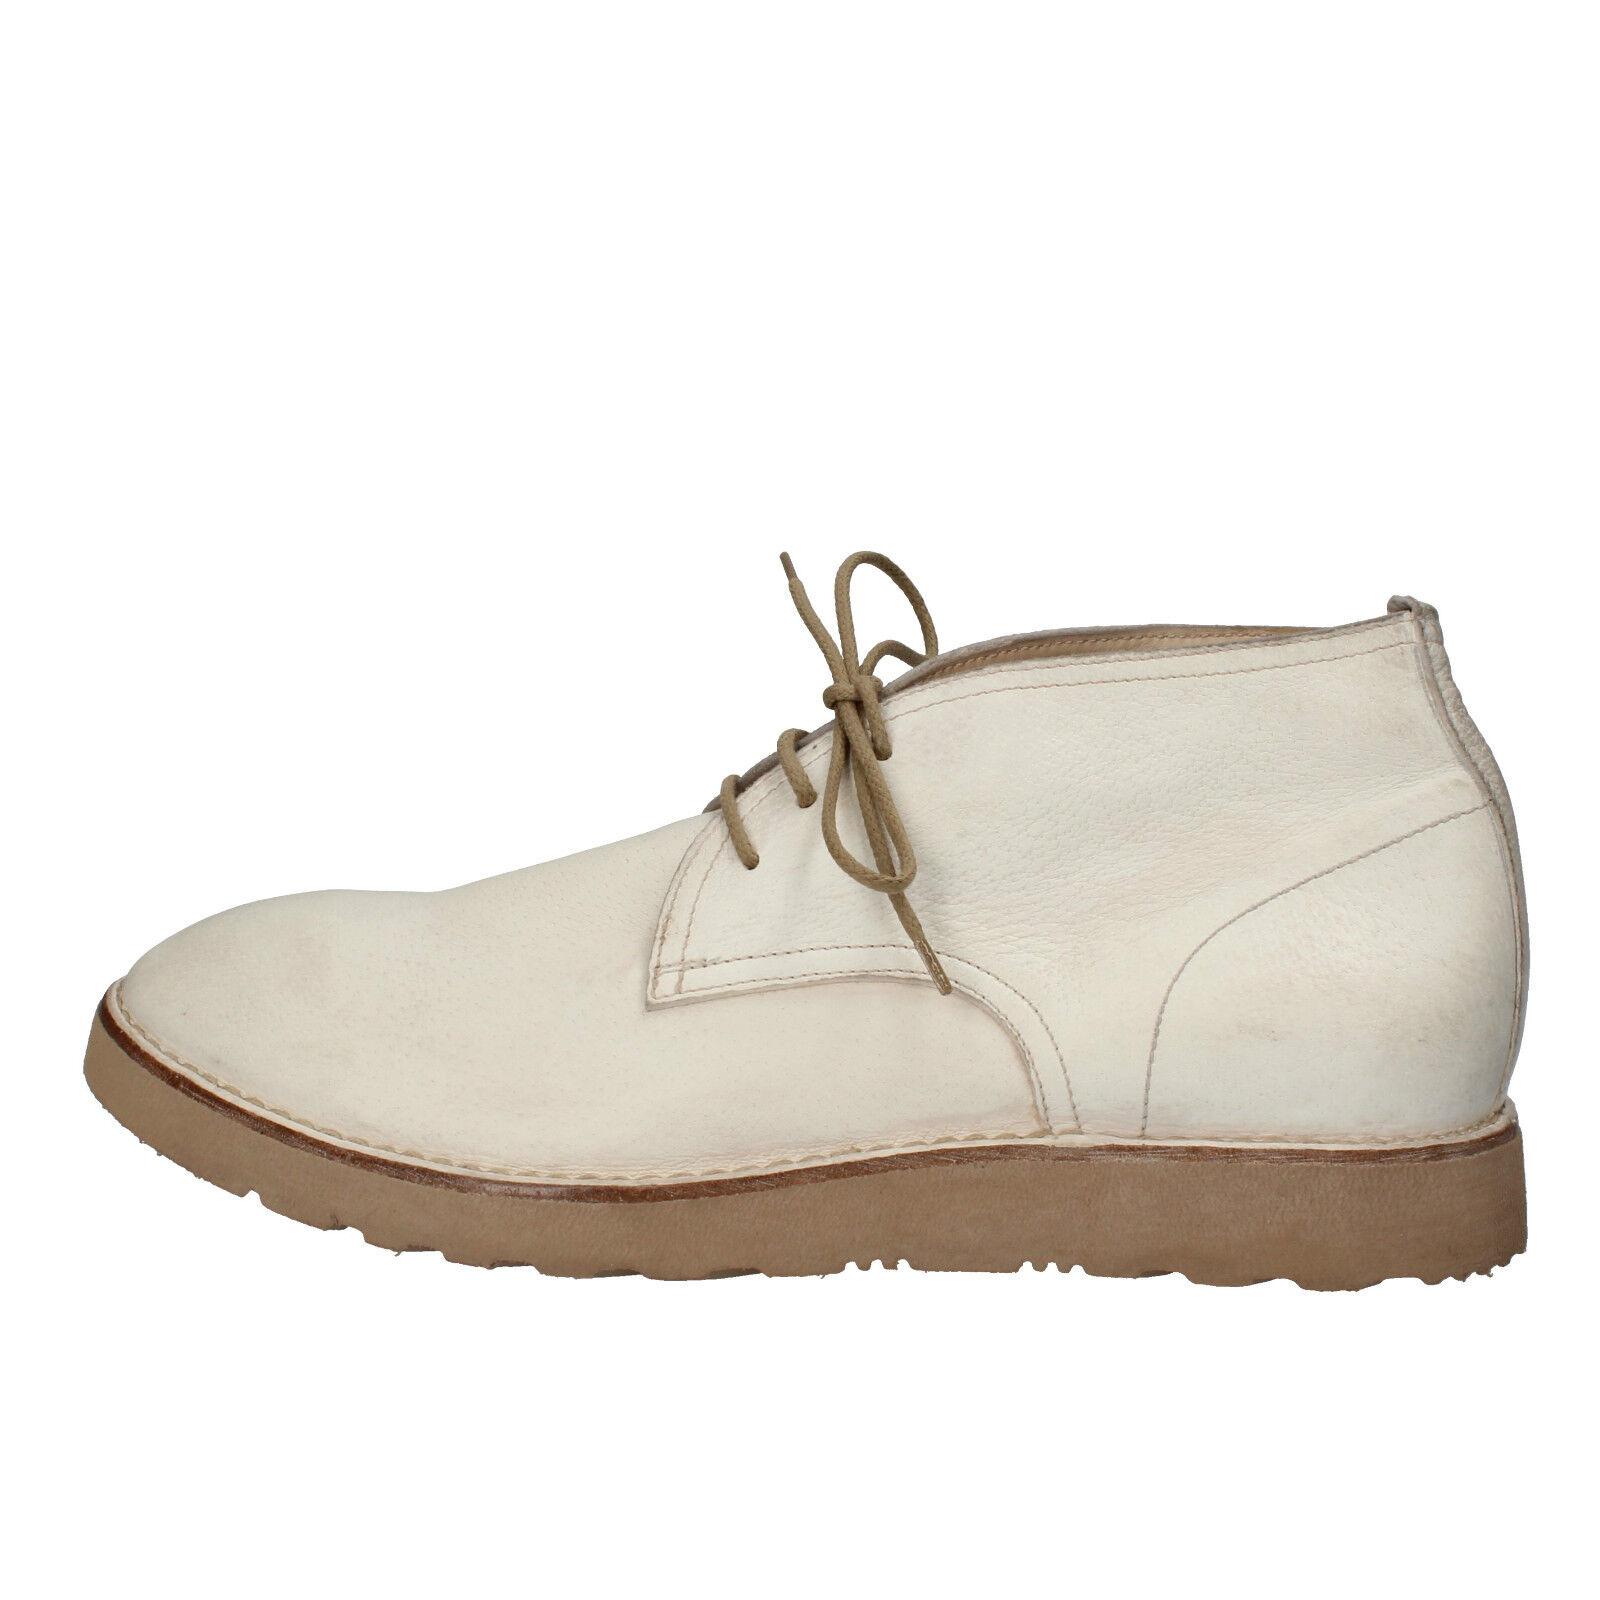 Herren schuhe MOMA 42 EU desert boots Weiß leder AE989-B